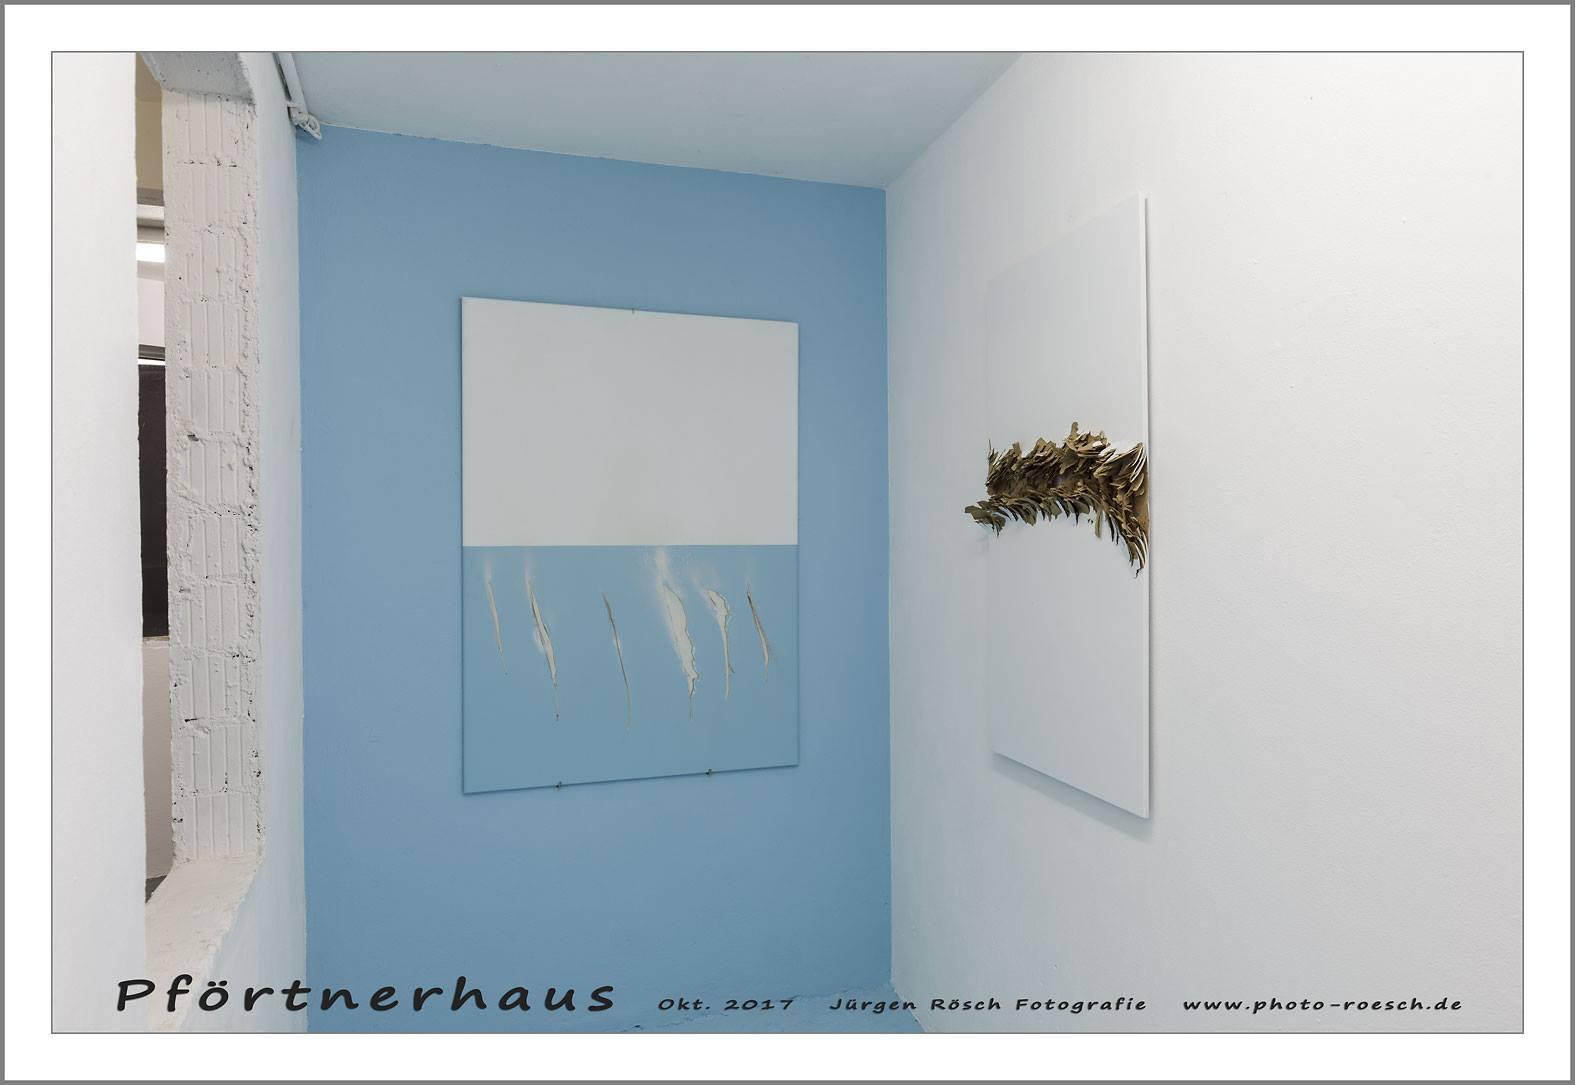 exhibitionview Pförtnerhaus